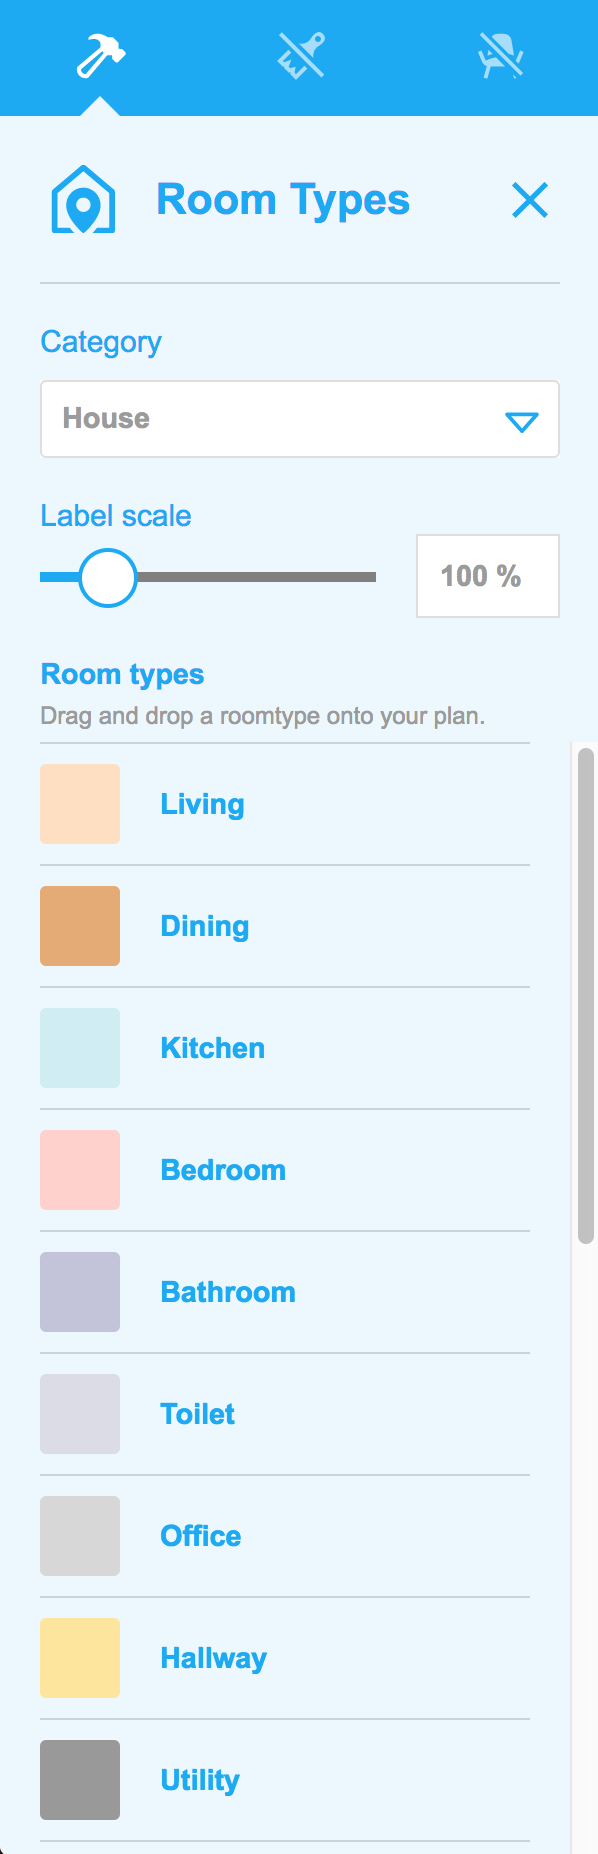 blogpostcontent-roomtypes.png